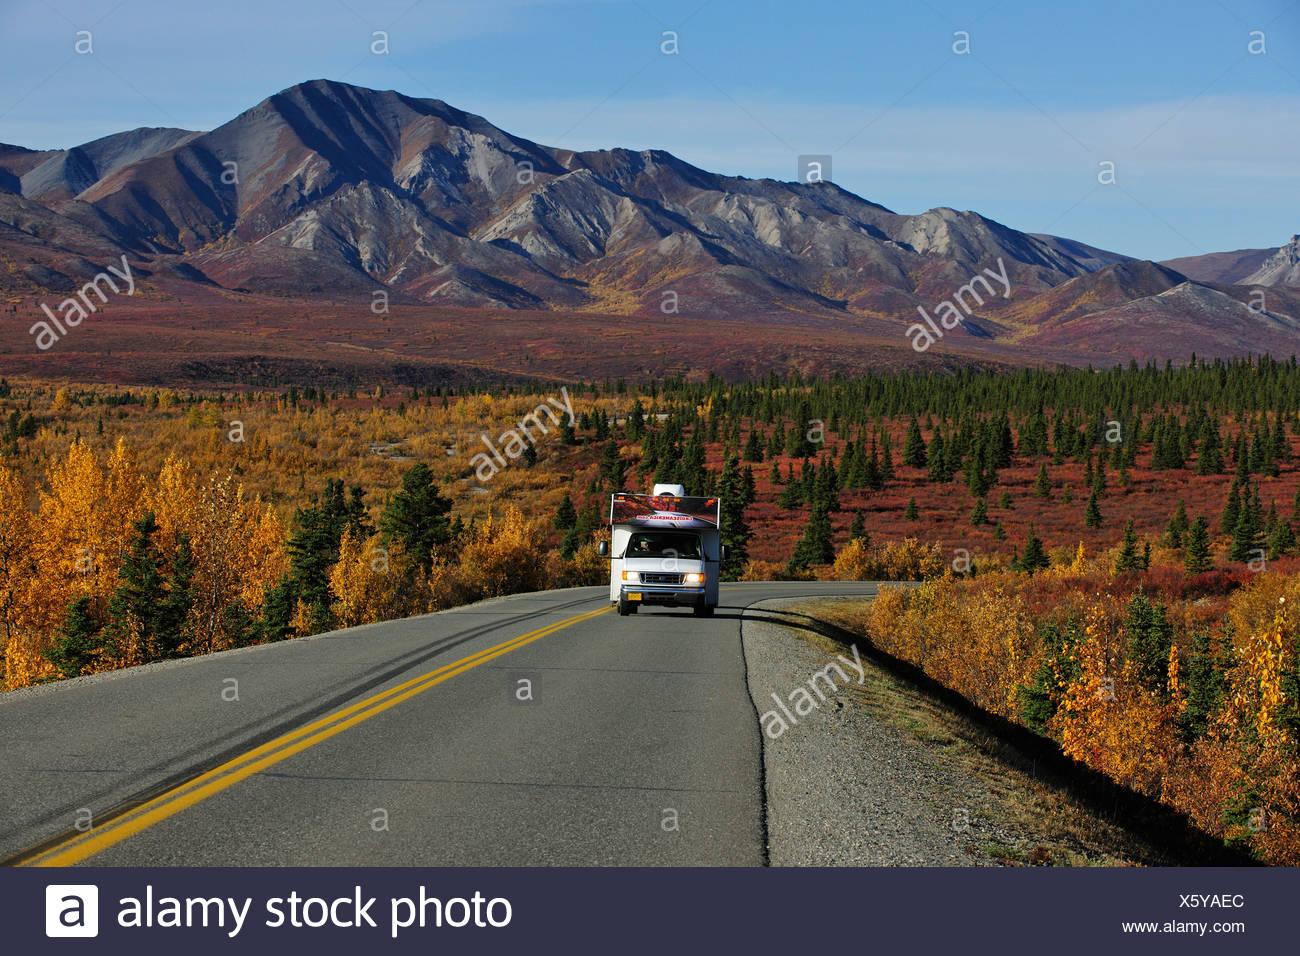 Motorhome on the road, Denali National Park, Alaska - Stock Image